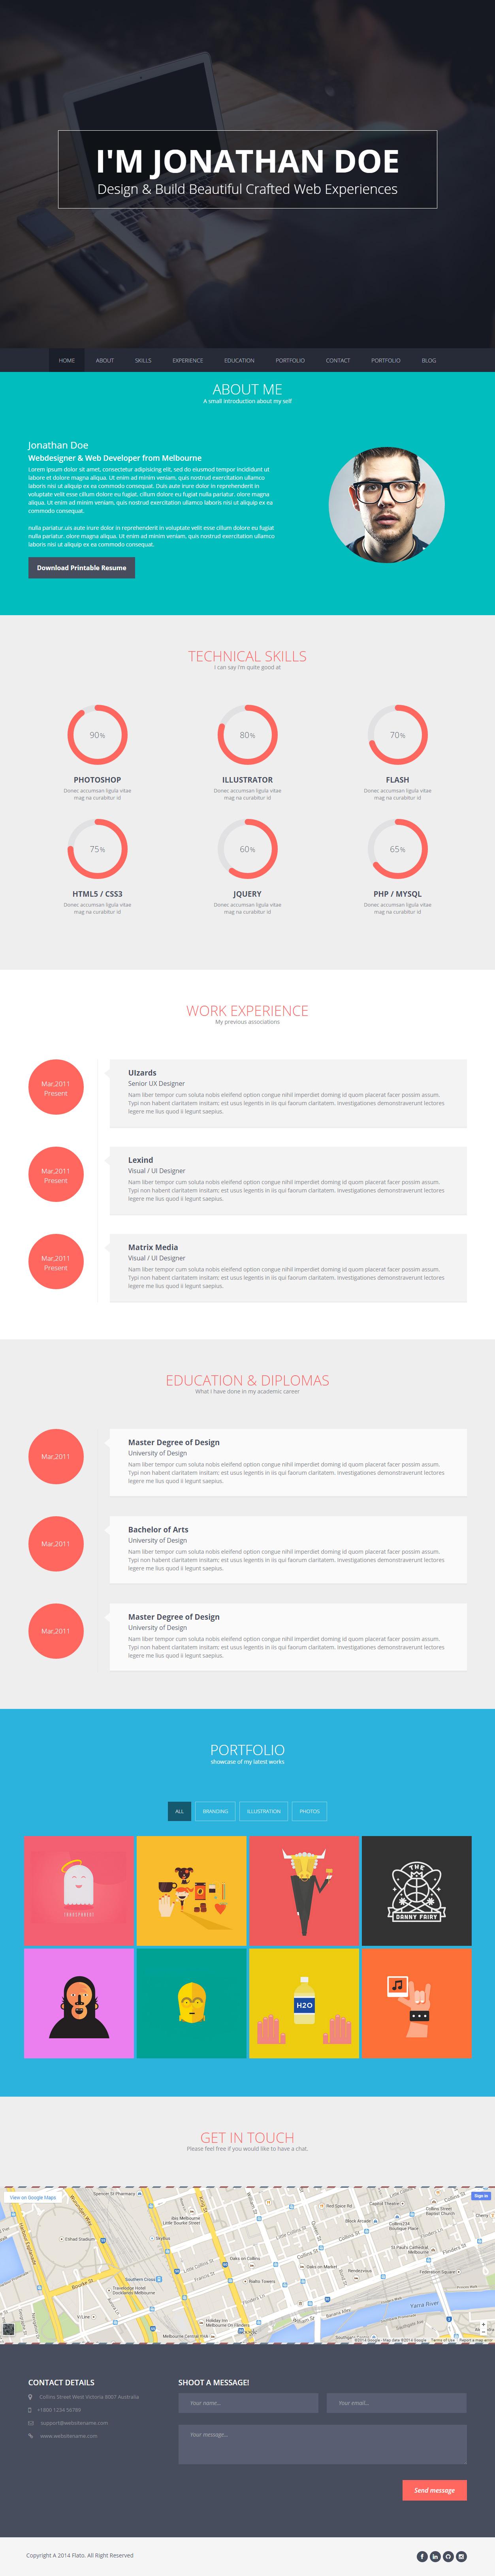 Flatoo Premium Responsive Vcard Wordpress Theme